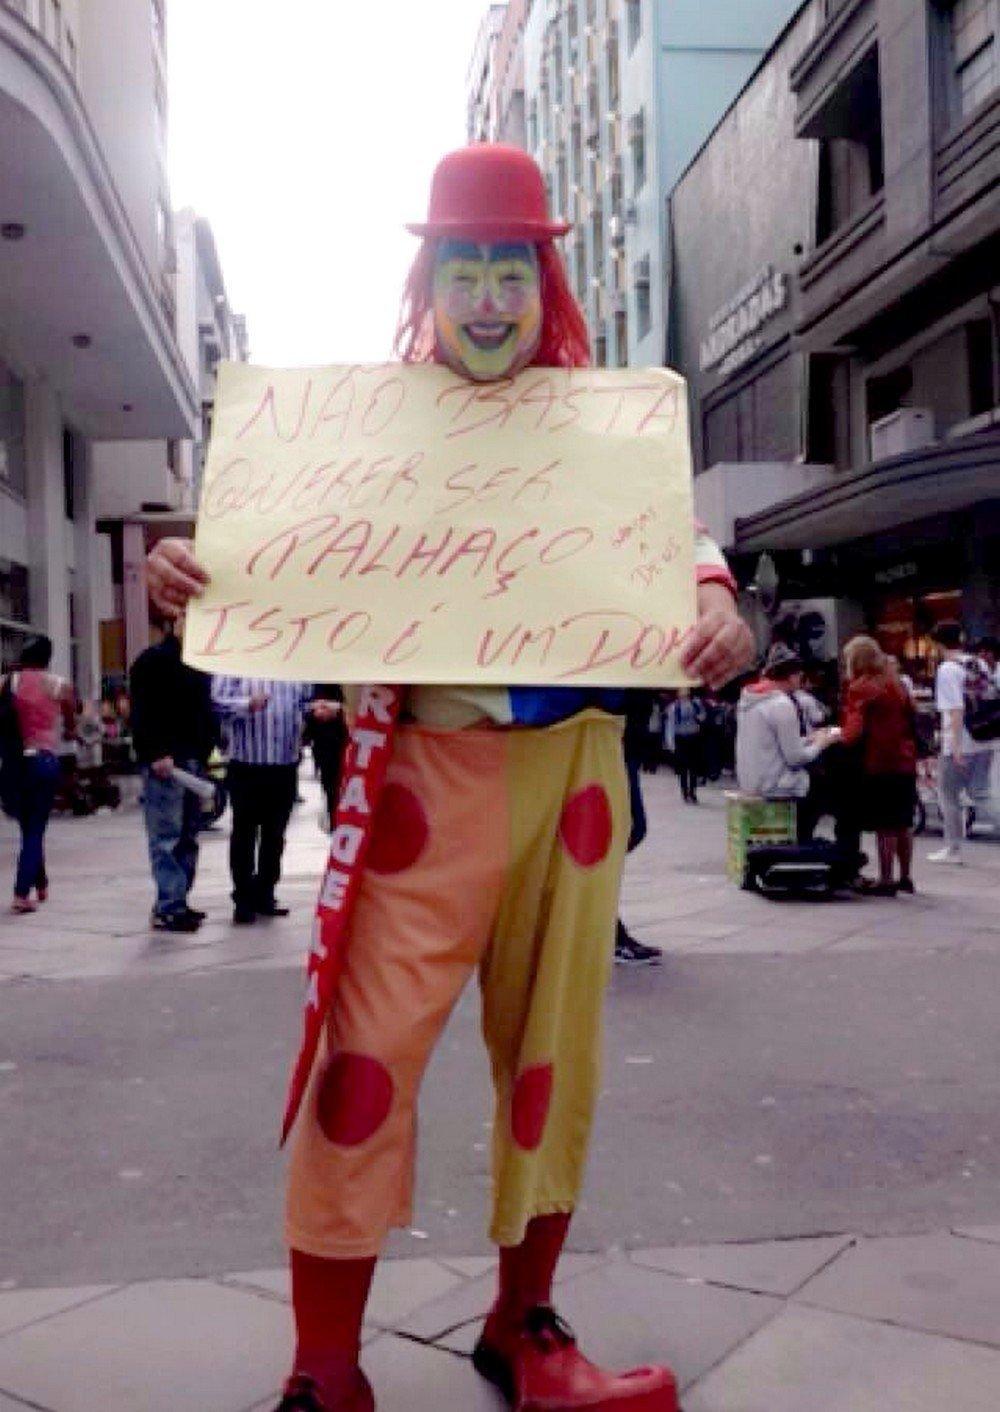 Ariel Brandão, the Sausage Clown at the protest